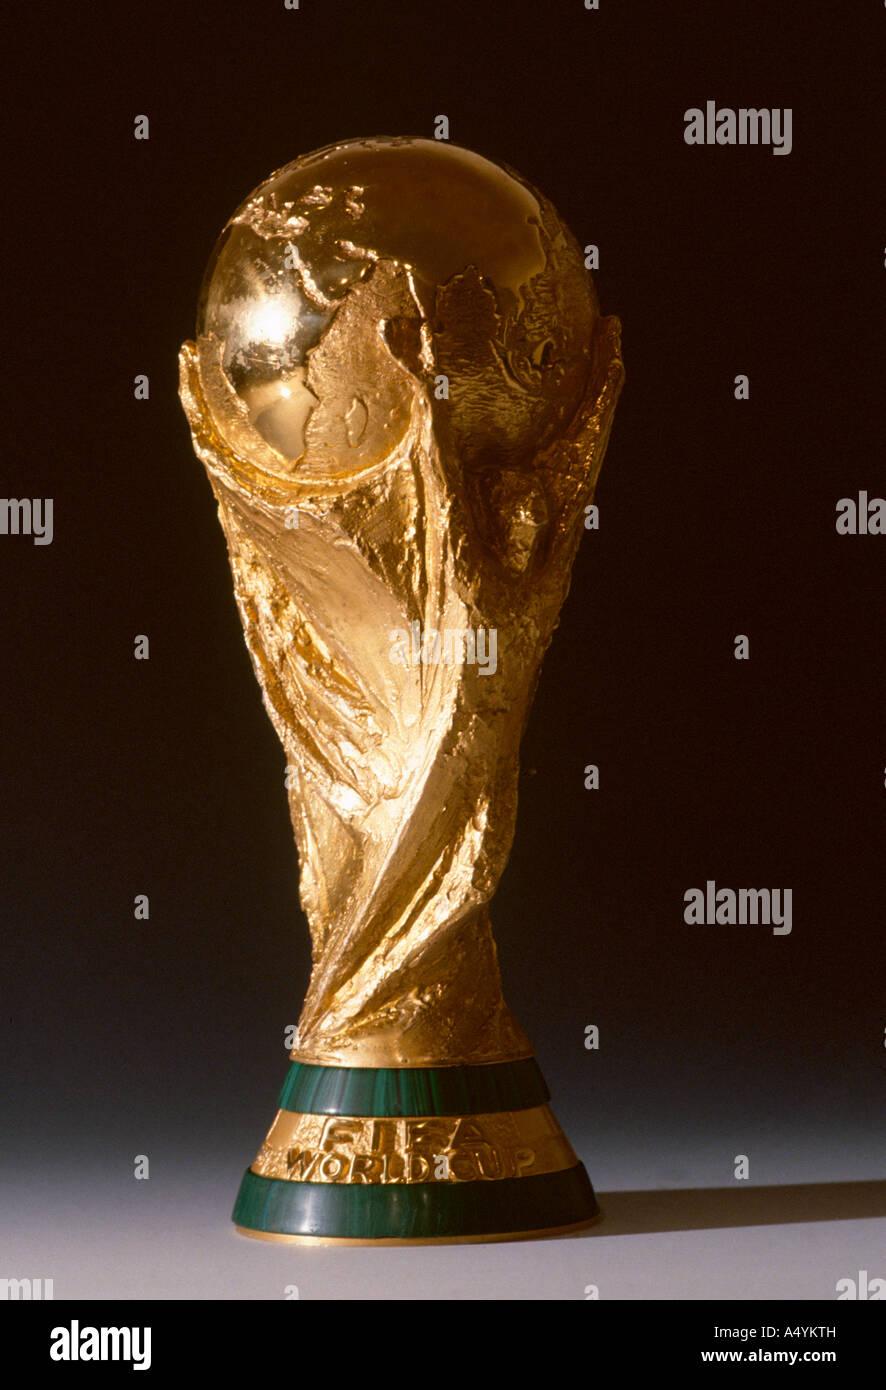 Fifa Pokal Fussball Fussball Wm 2010 Stockfoto Bild 11148880